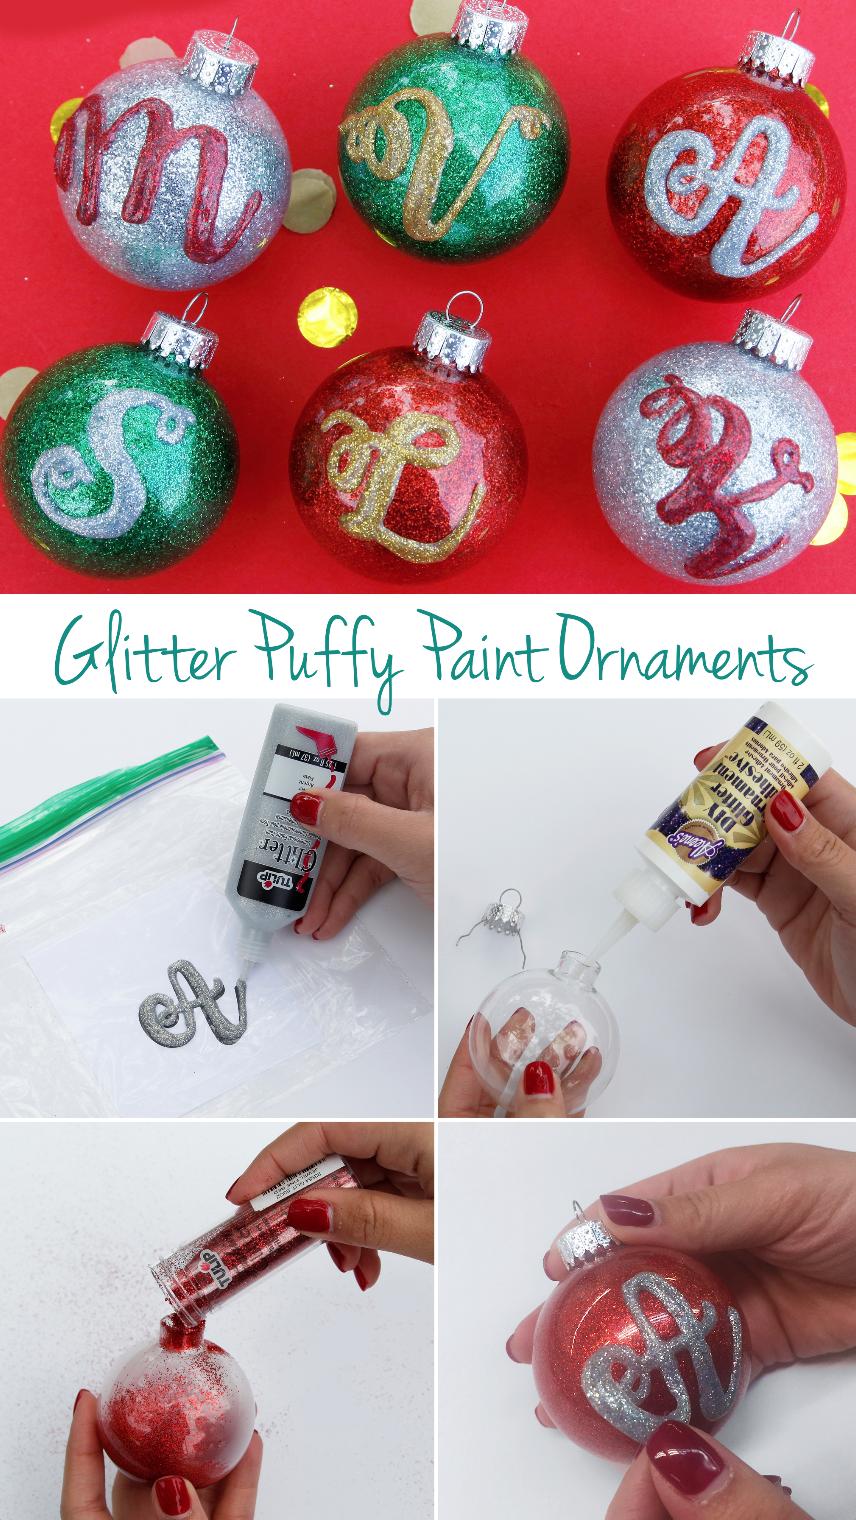 Glitter Monogram Ornaments Glass Ornaments Diy Monogrammed Christmas Ornaments Christmas Ornaments Homemade